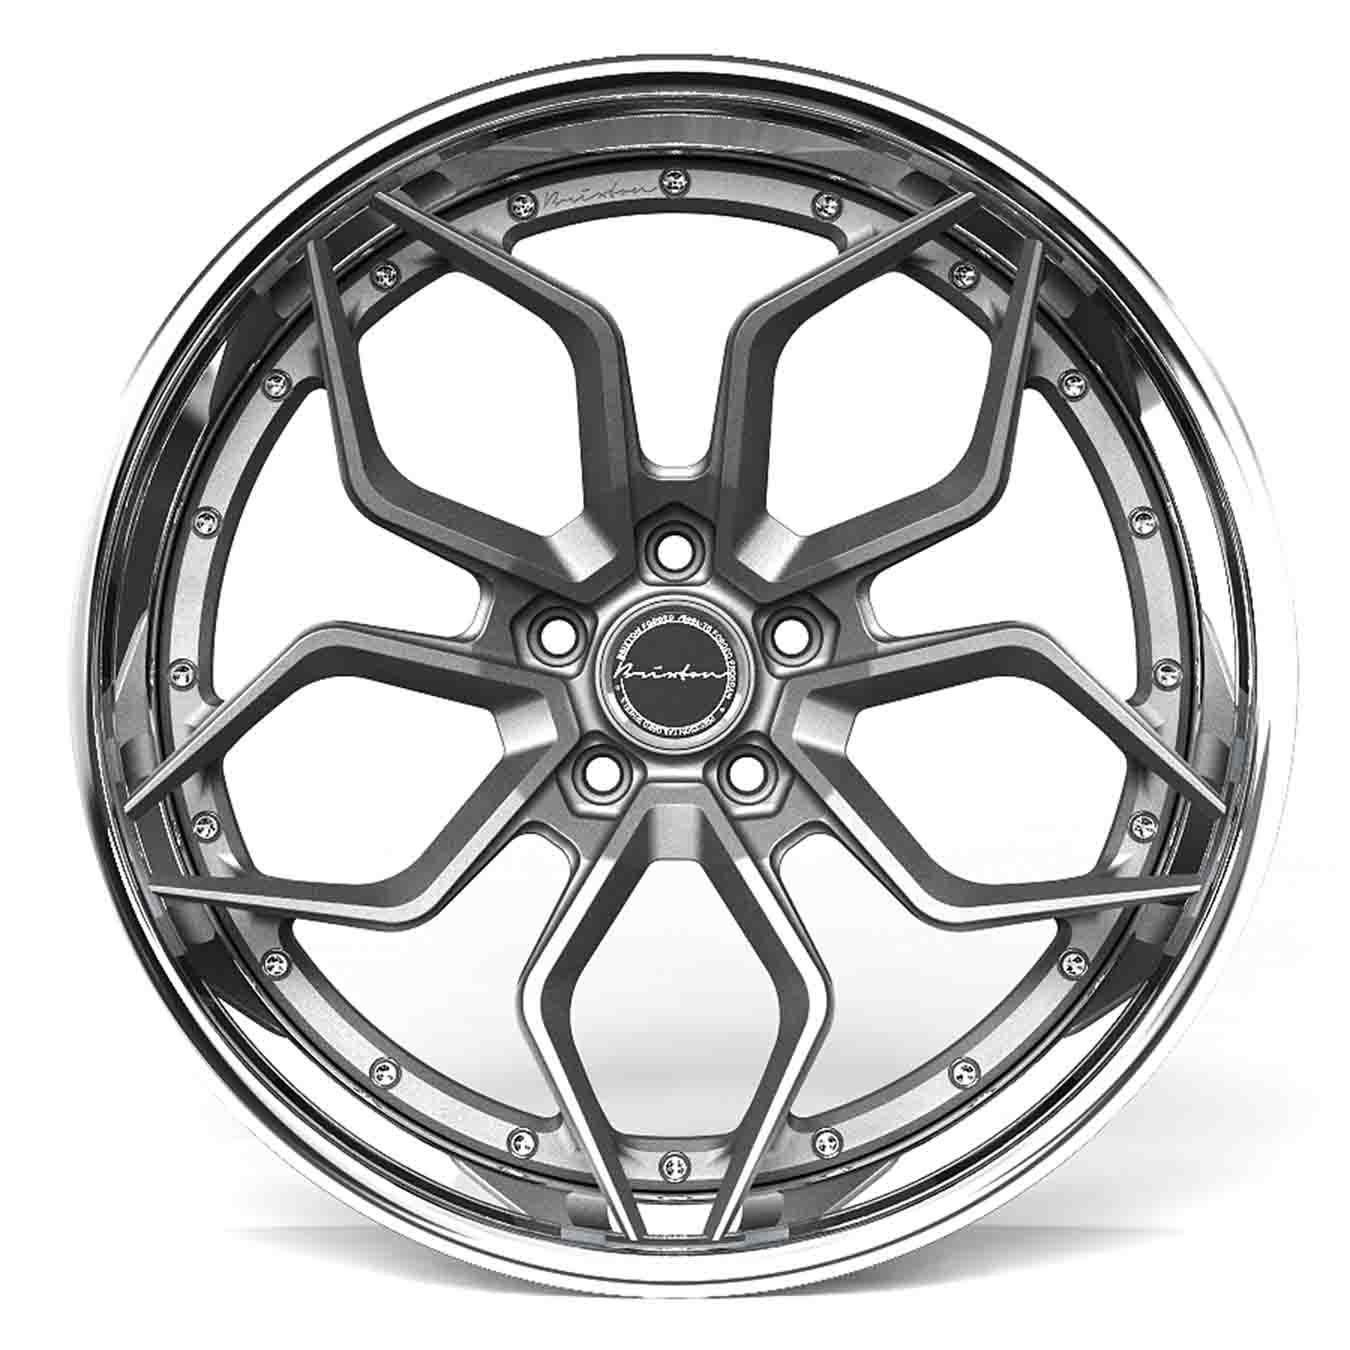 Brixton PF9 (Targa Series) forged wheels